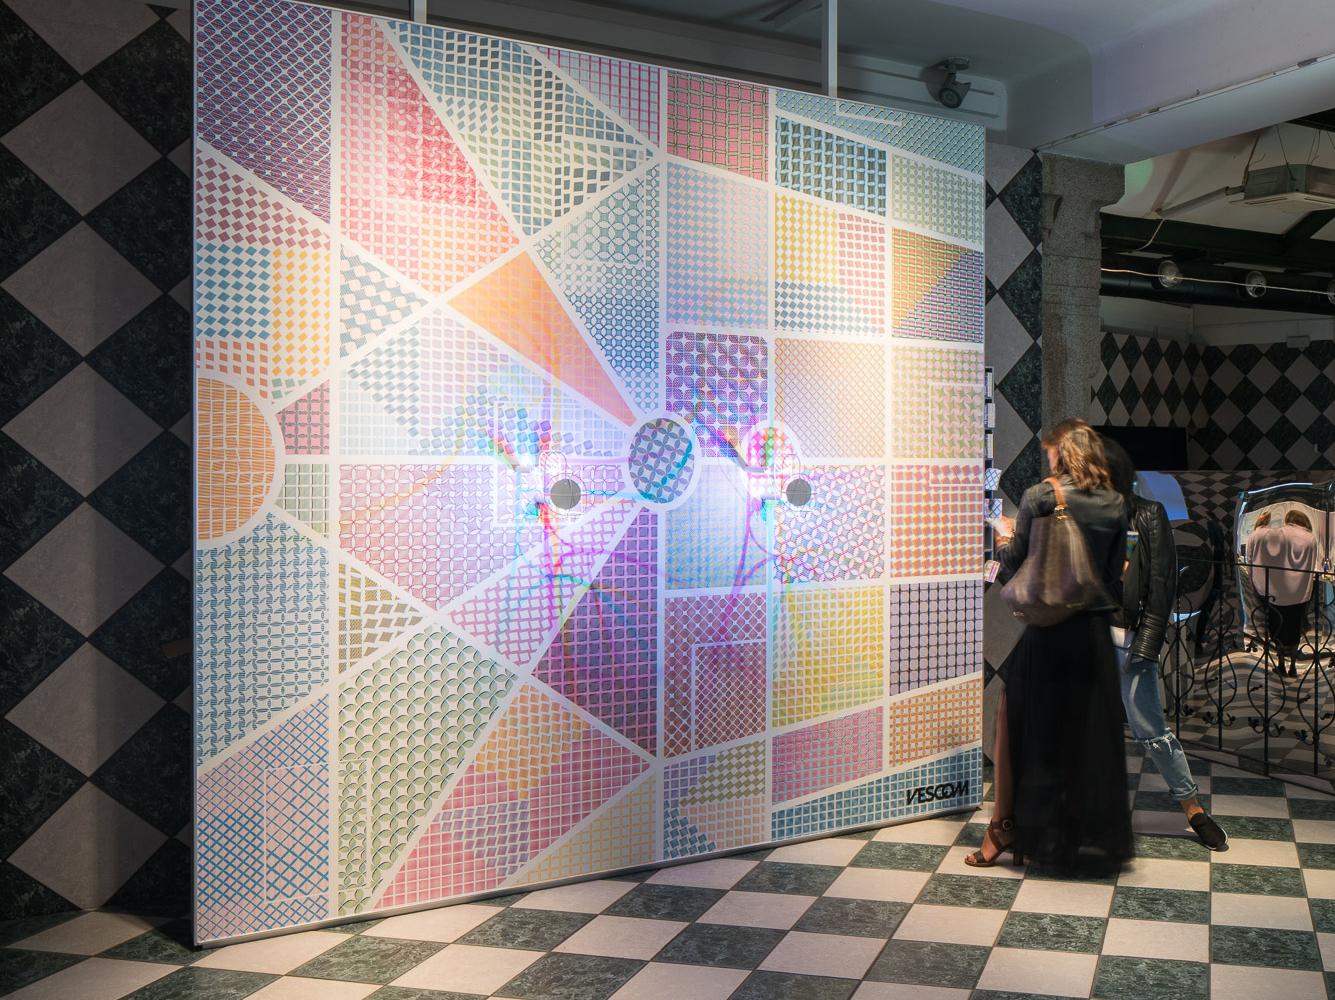 Wallcovering print ontwerp uw eigen wand - Ontwerp wandbekleding ...